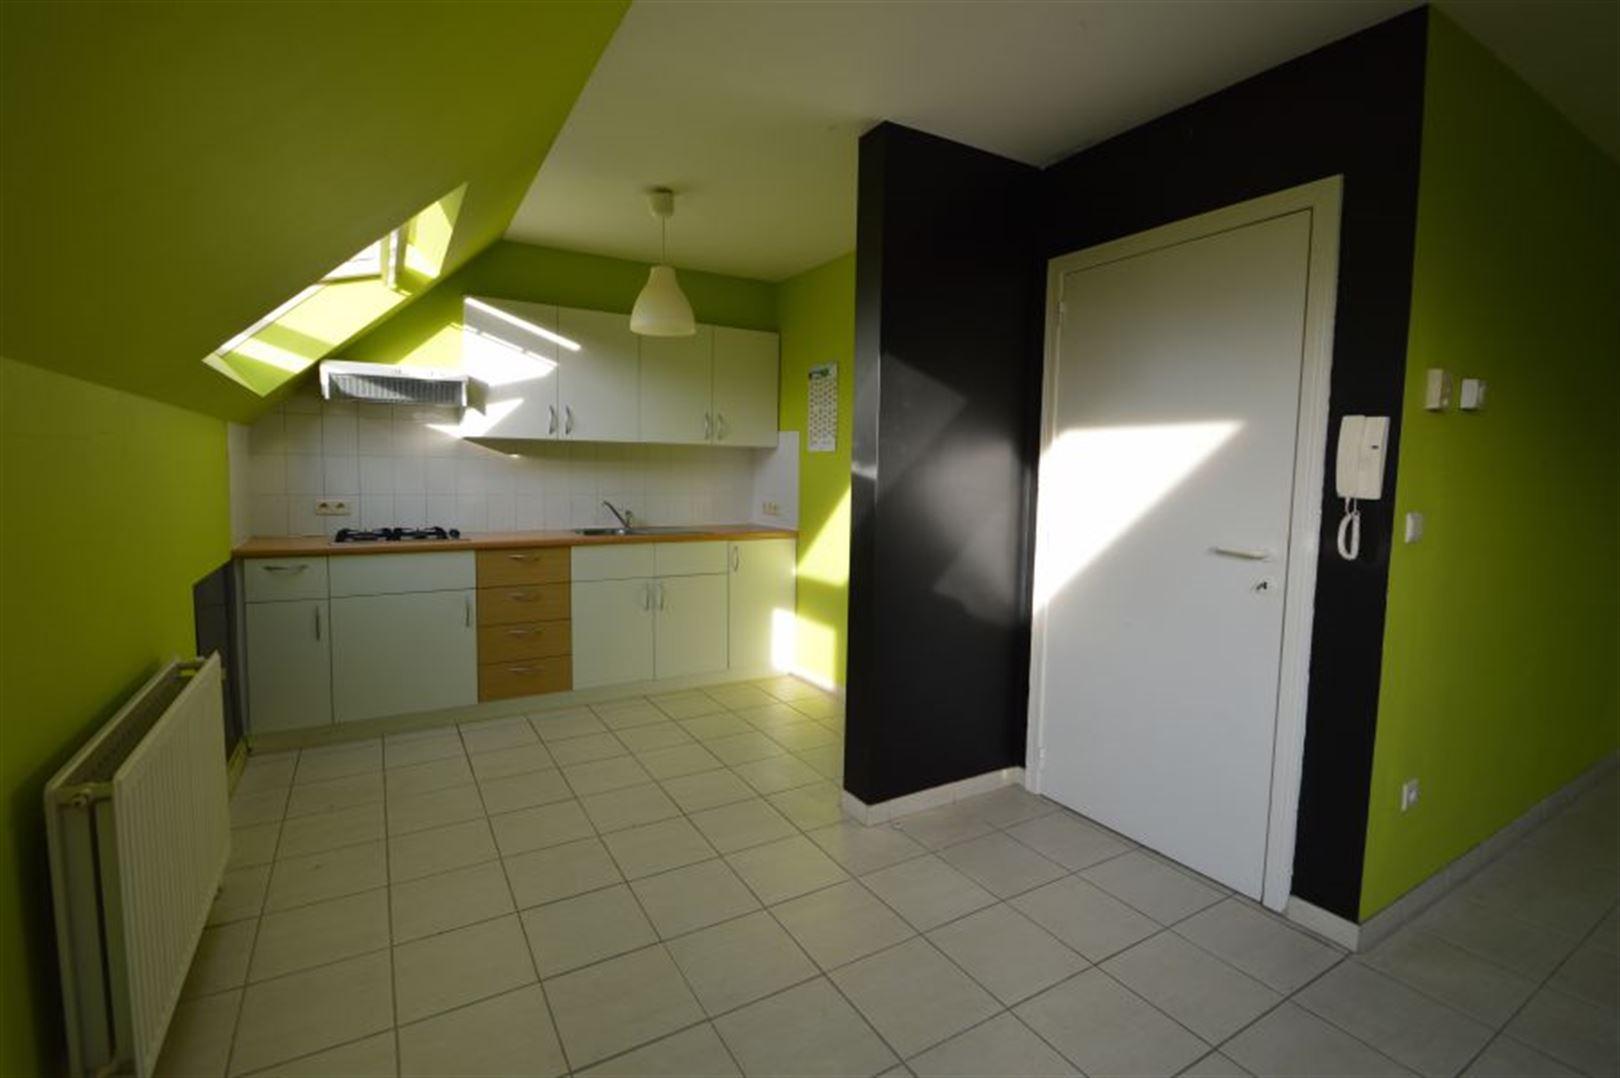 Foto 3 : Duplex/Penthouse te 9200 Baasrode (België) - Prijs € 585